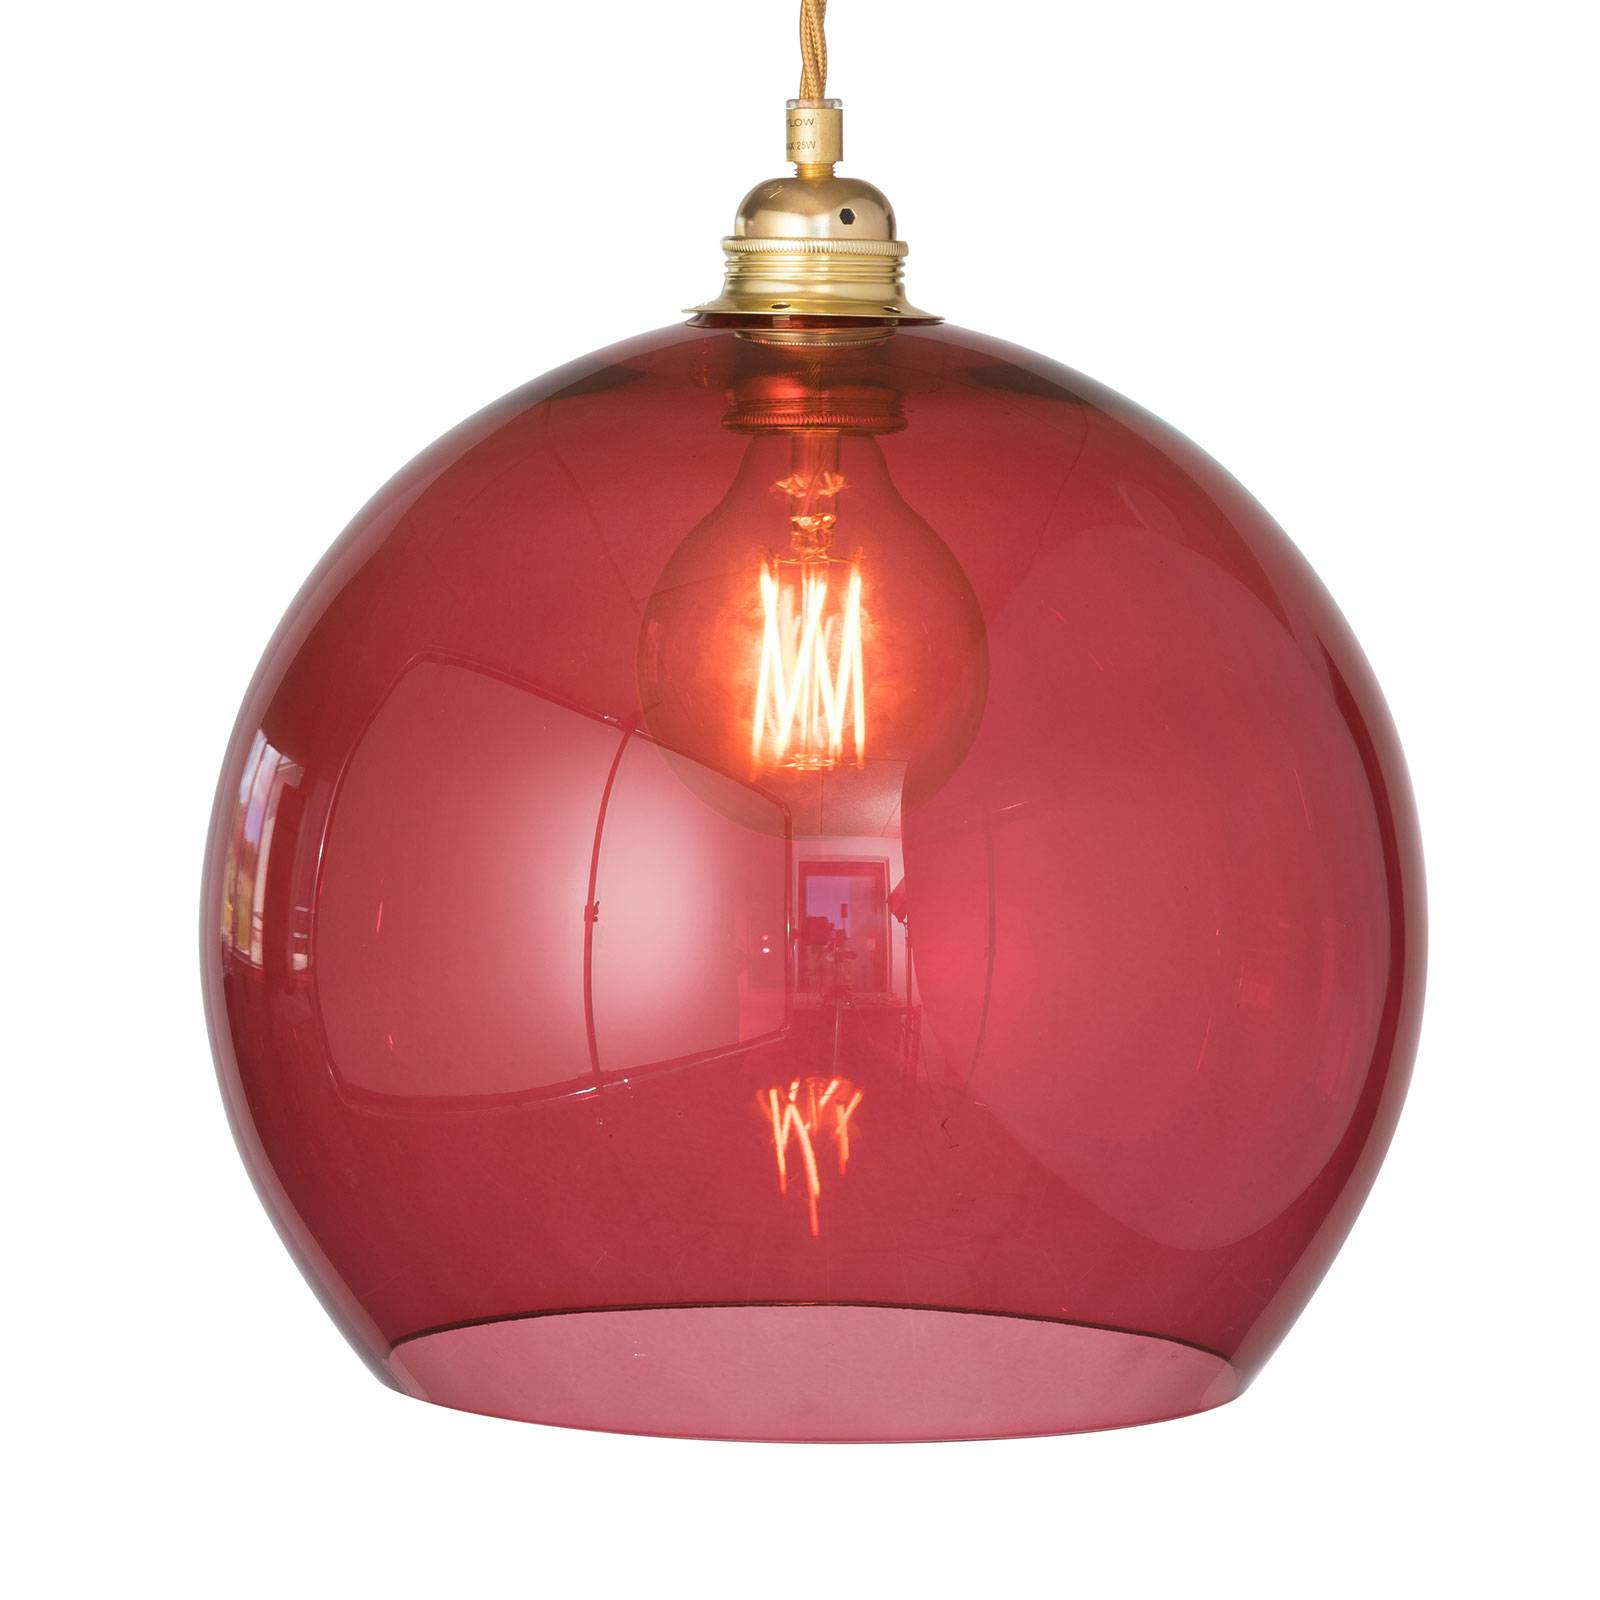 EBB & FLOW Rowan hanglamp goud/rood Ø 28cm